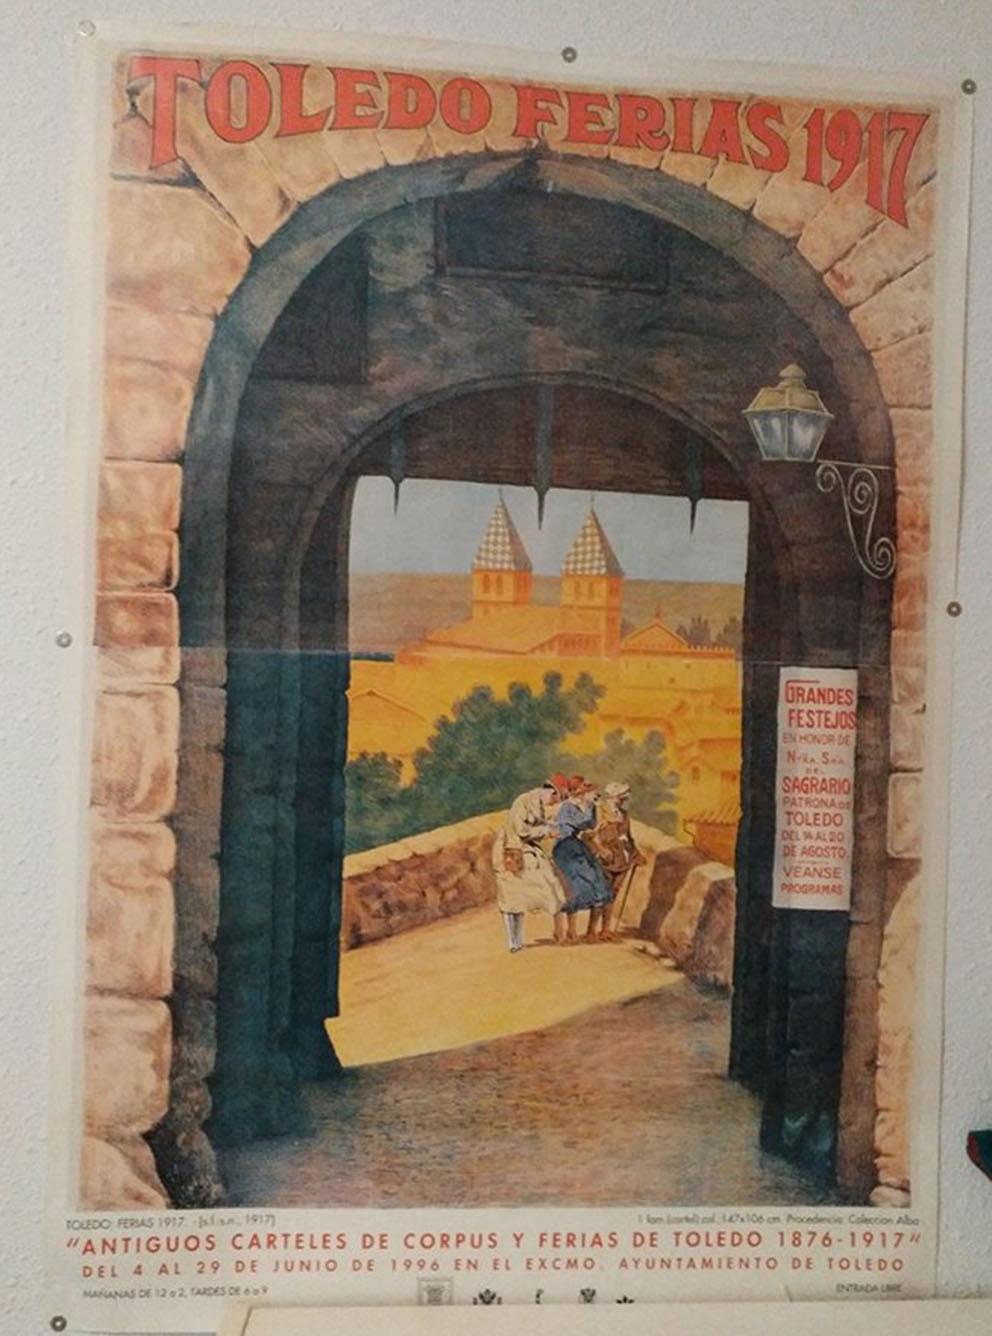 Cartel de la Feria de Toledo de 1917, hace un siglo